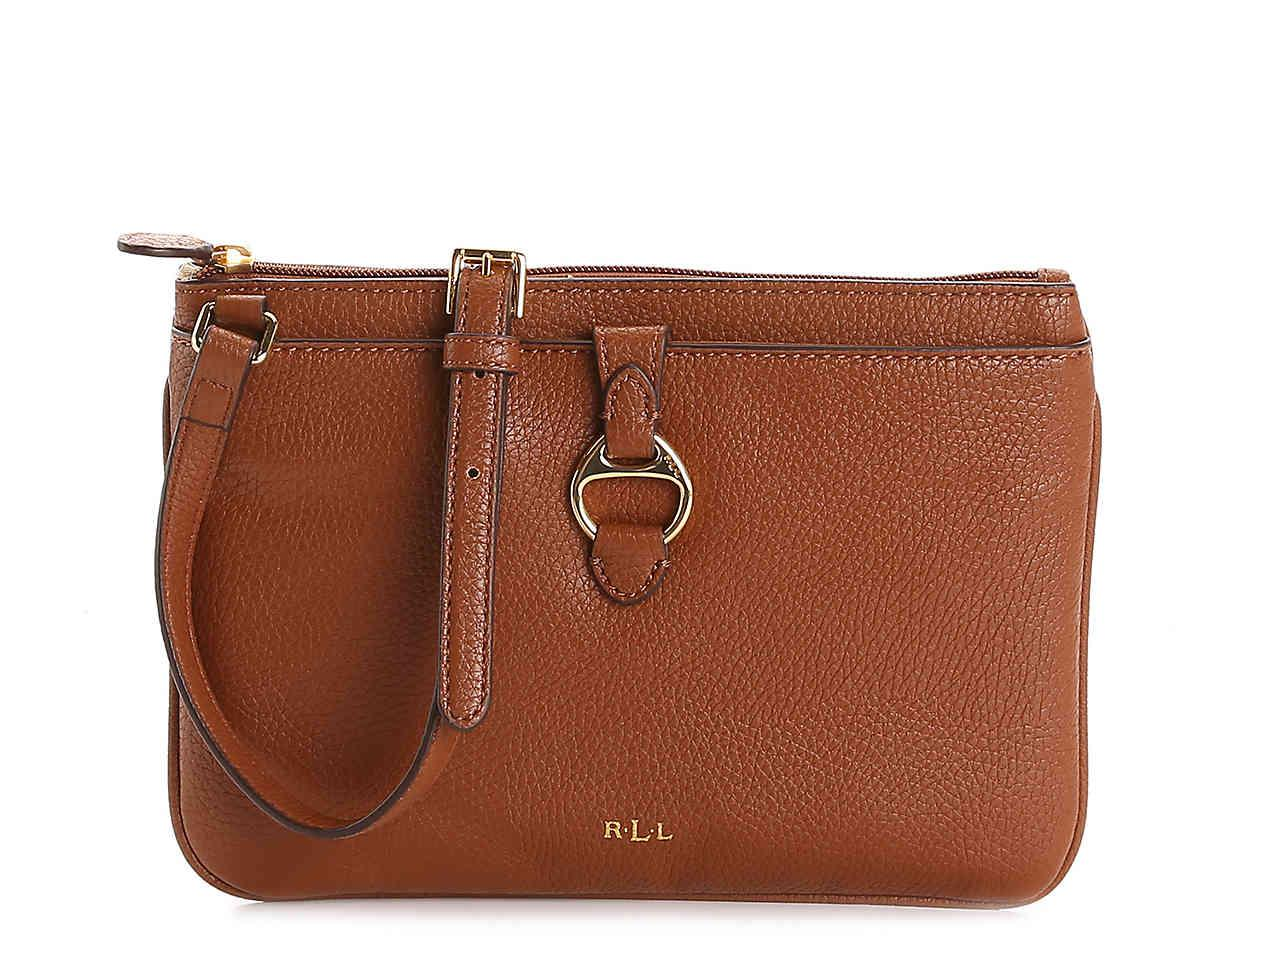 ae1ac1a37 Lauren by Ralph Lauren Anfield Ii Crossbody Bag in Brown - Lyst